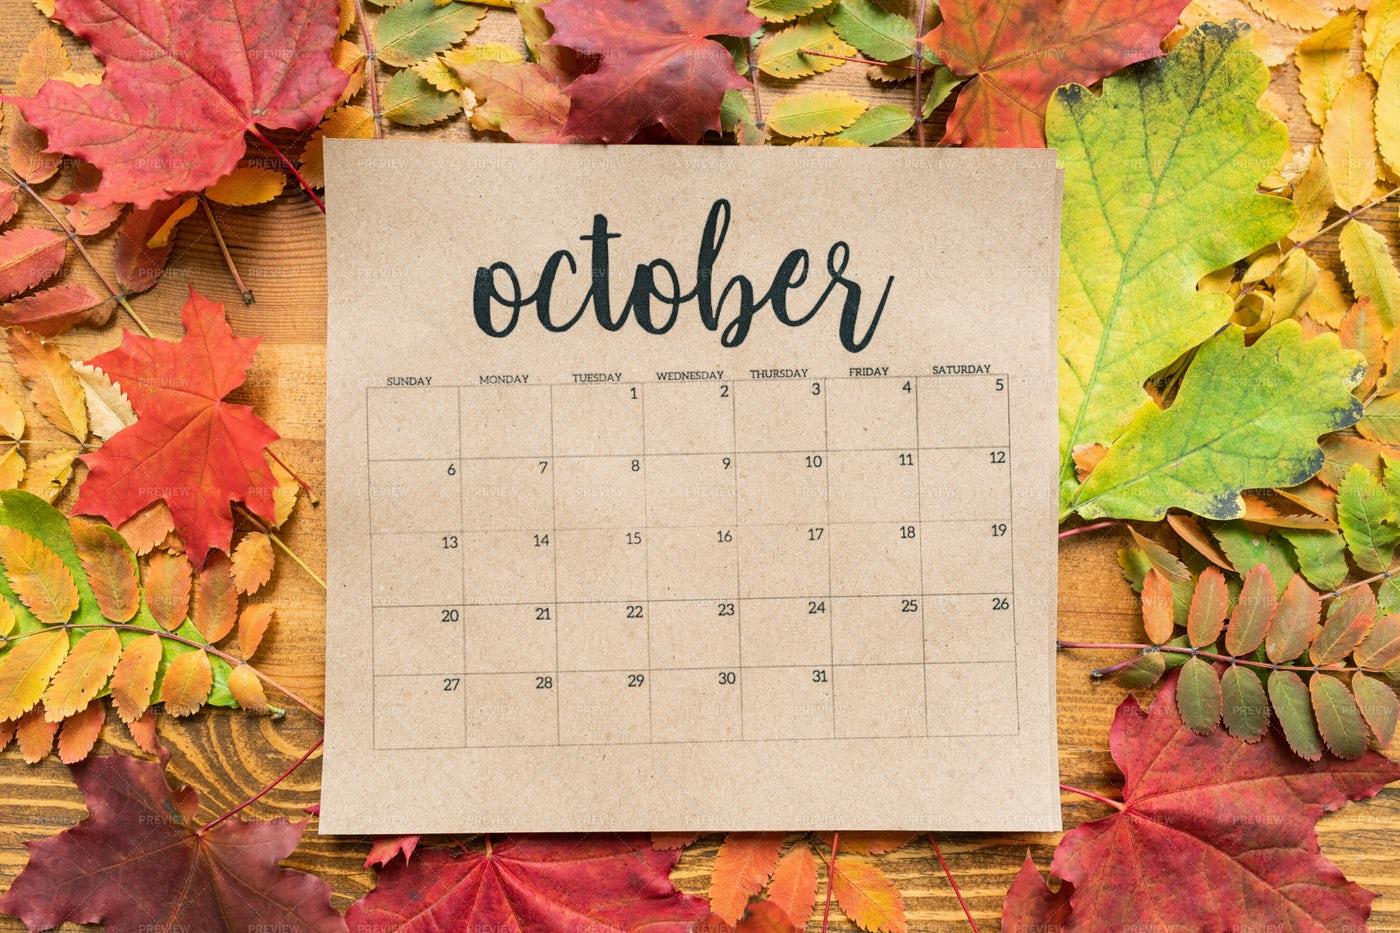 Overview Of October Calendar Sheet...: Stock Photos